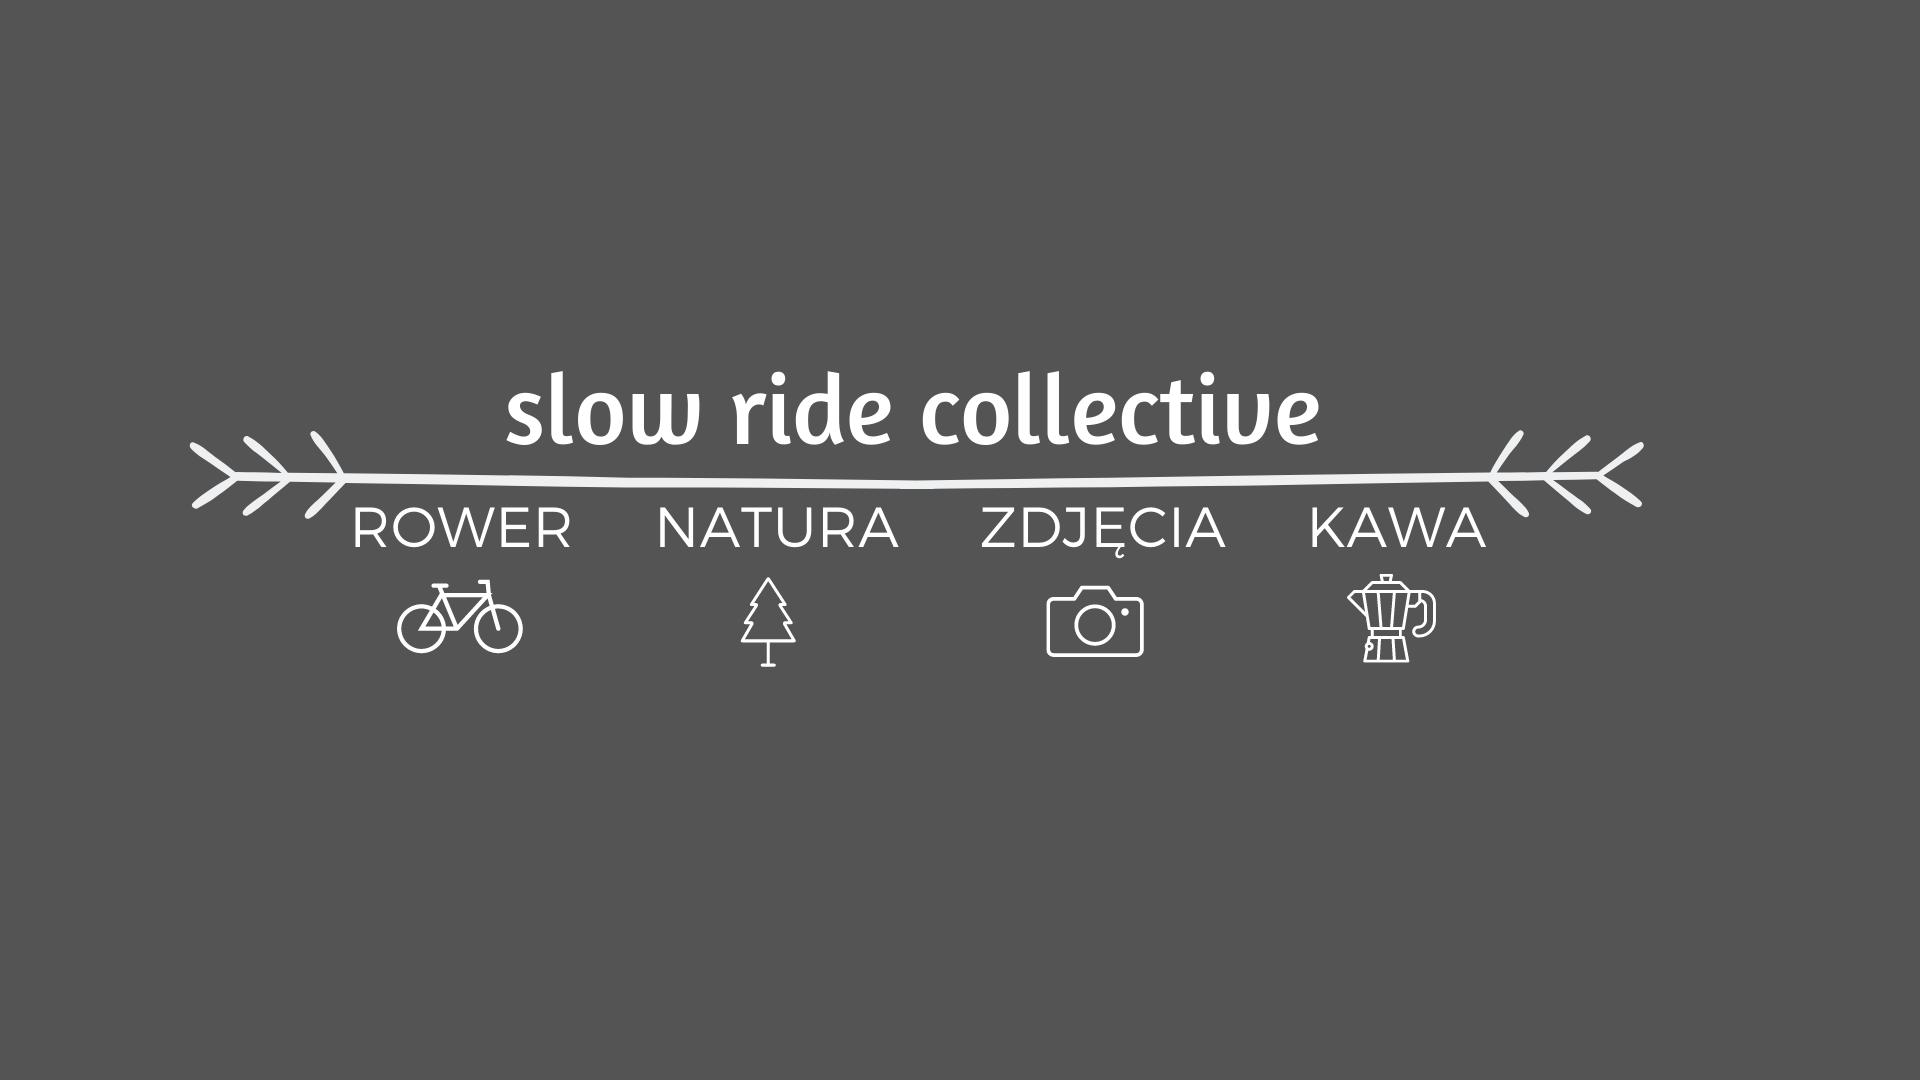 słów ride collective